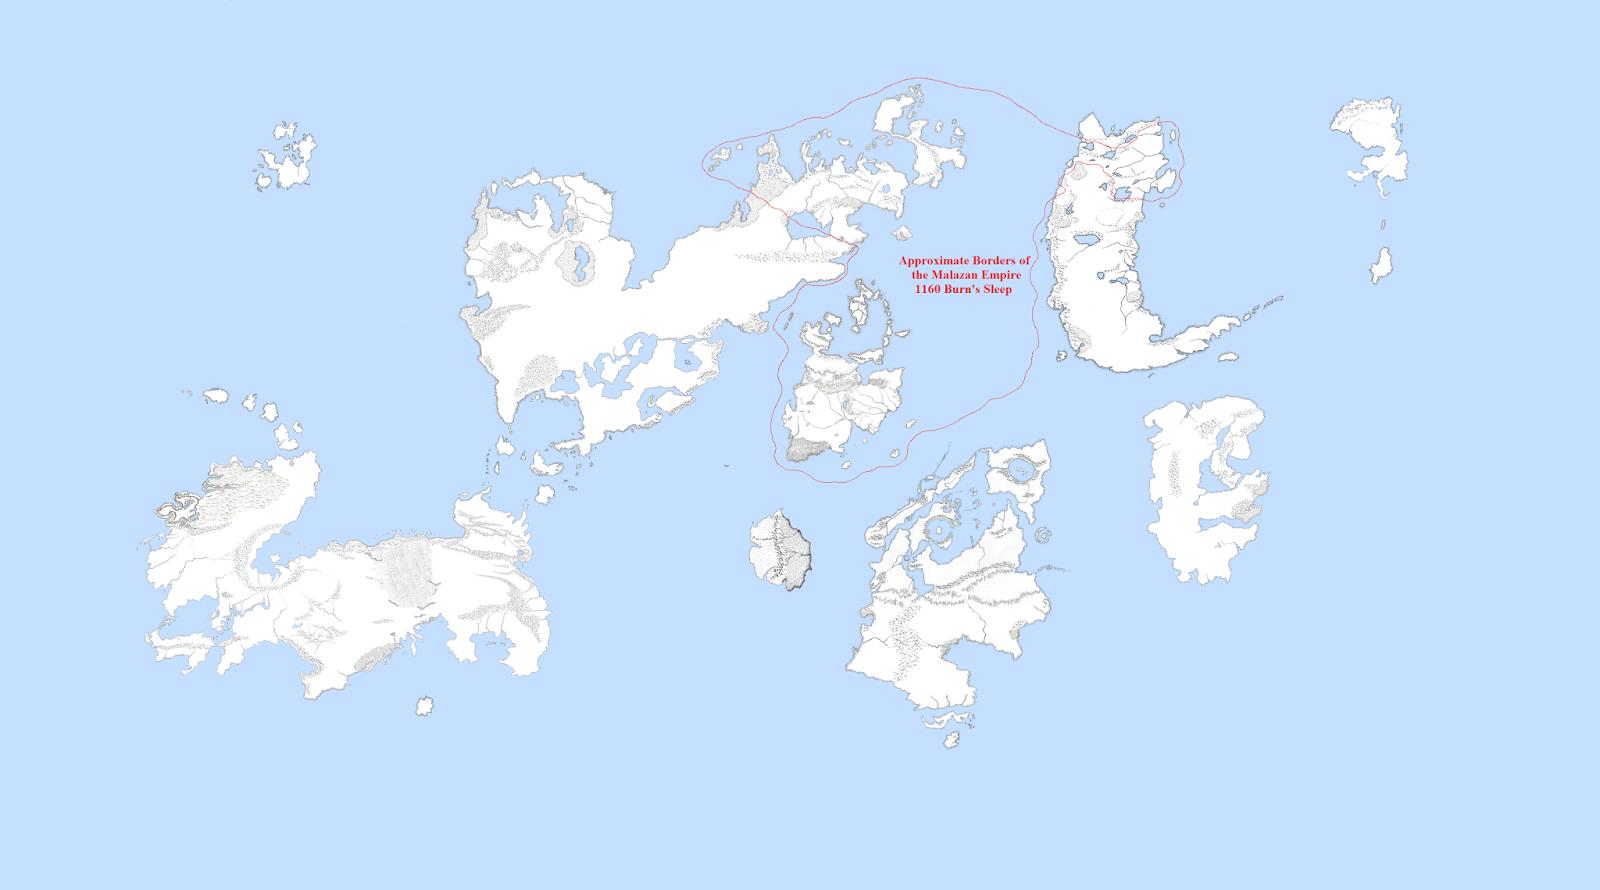 maps by adam whitehead